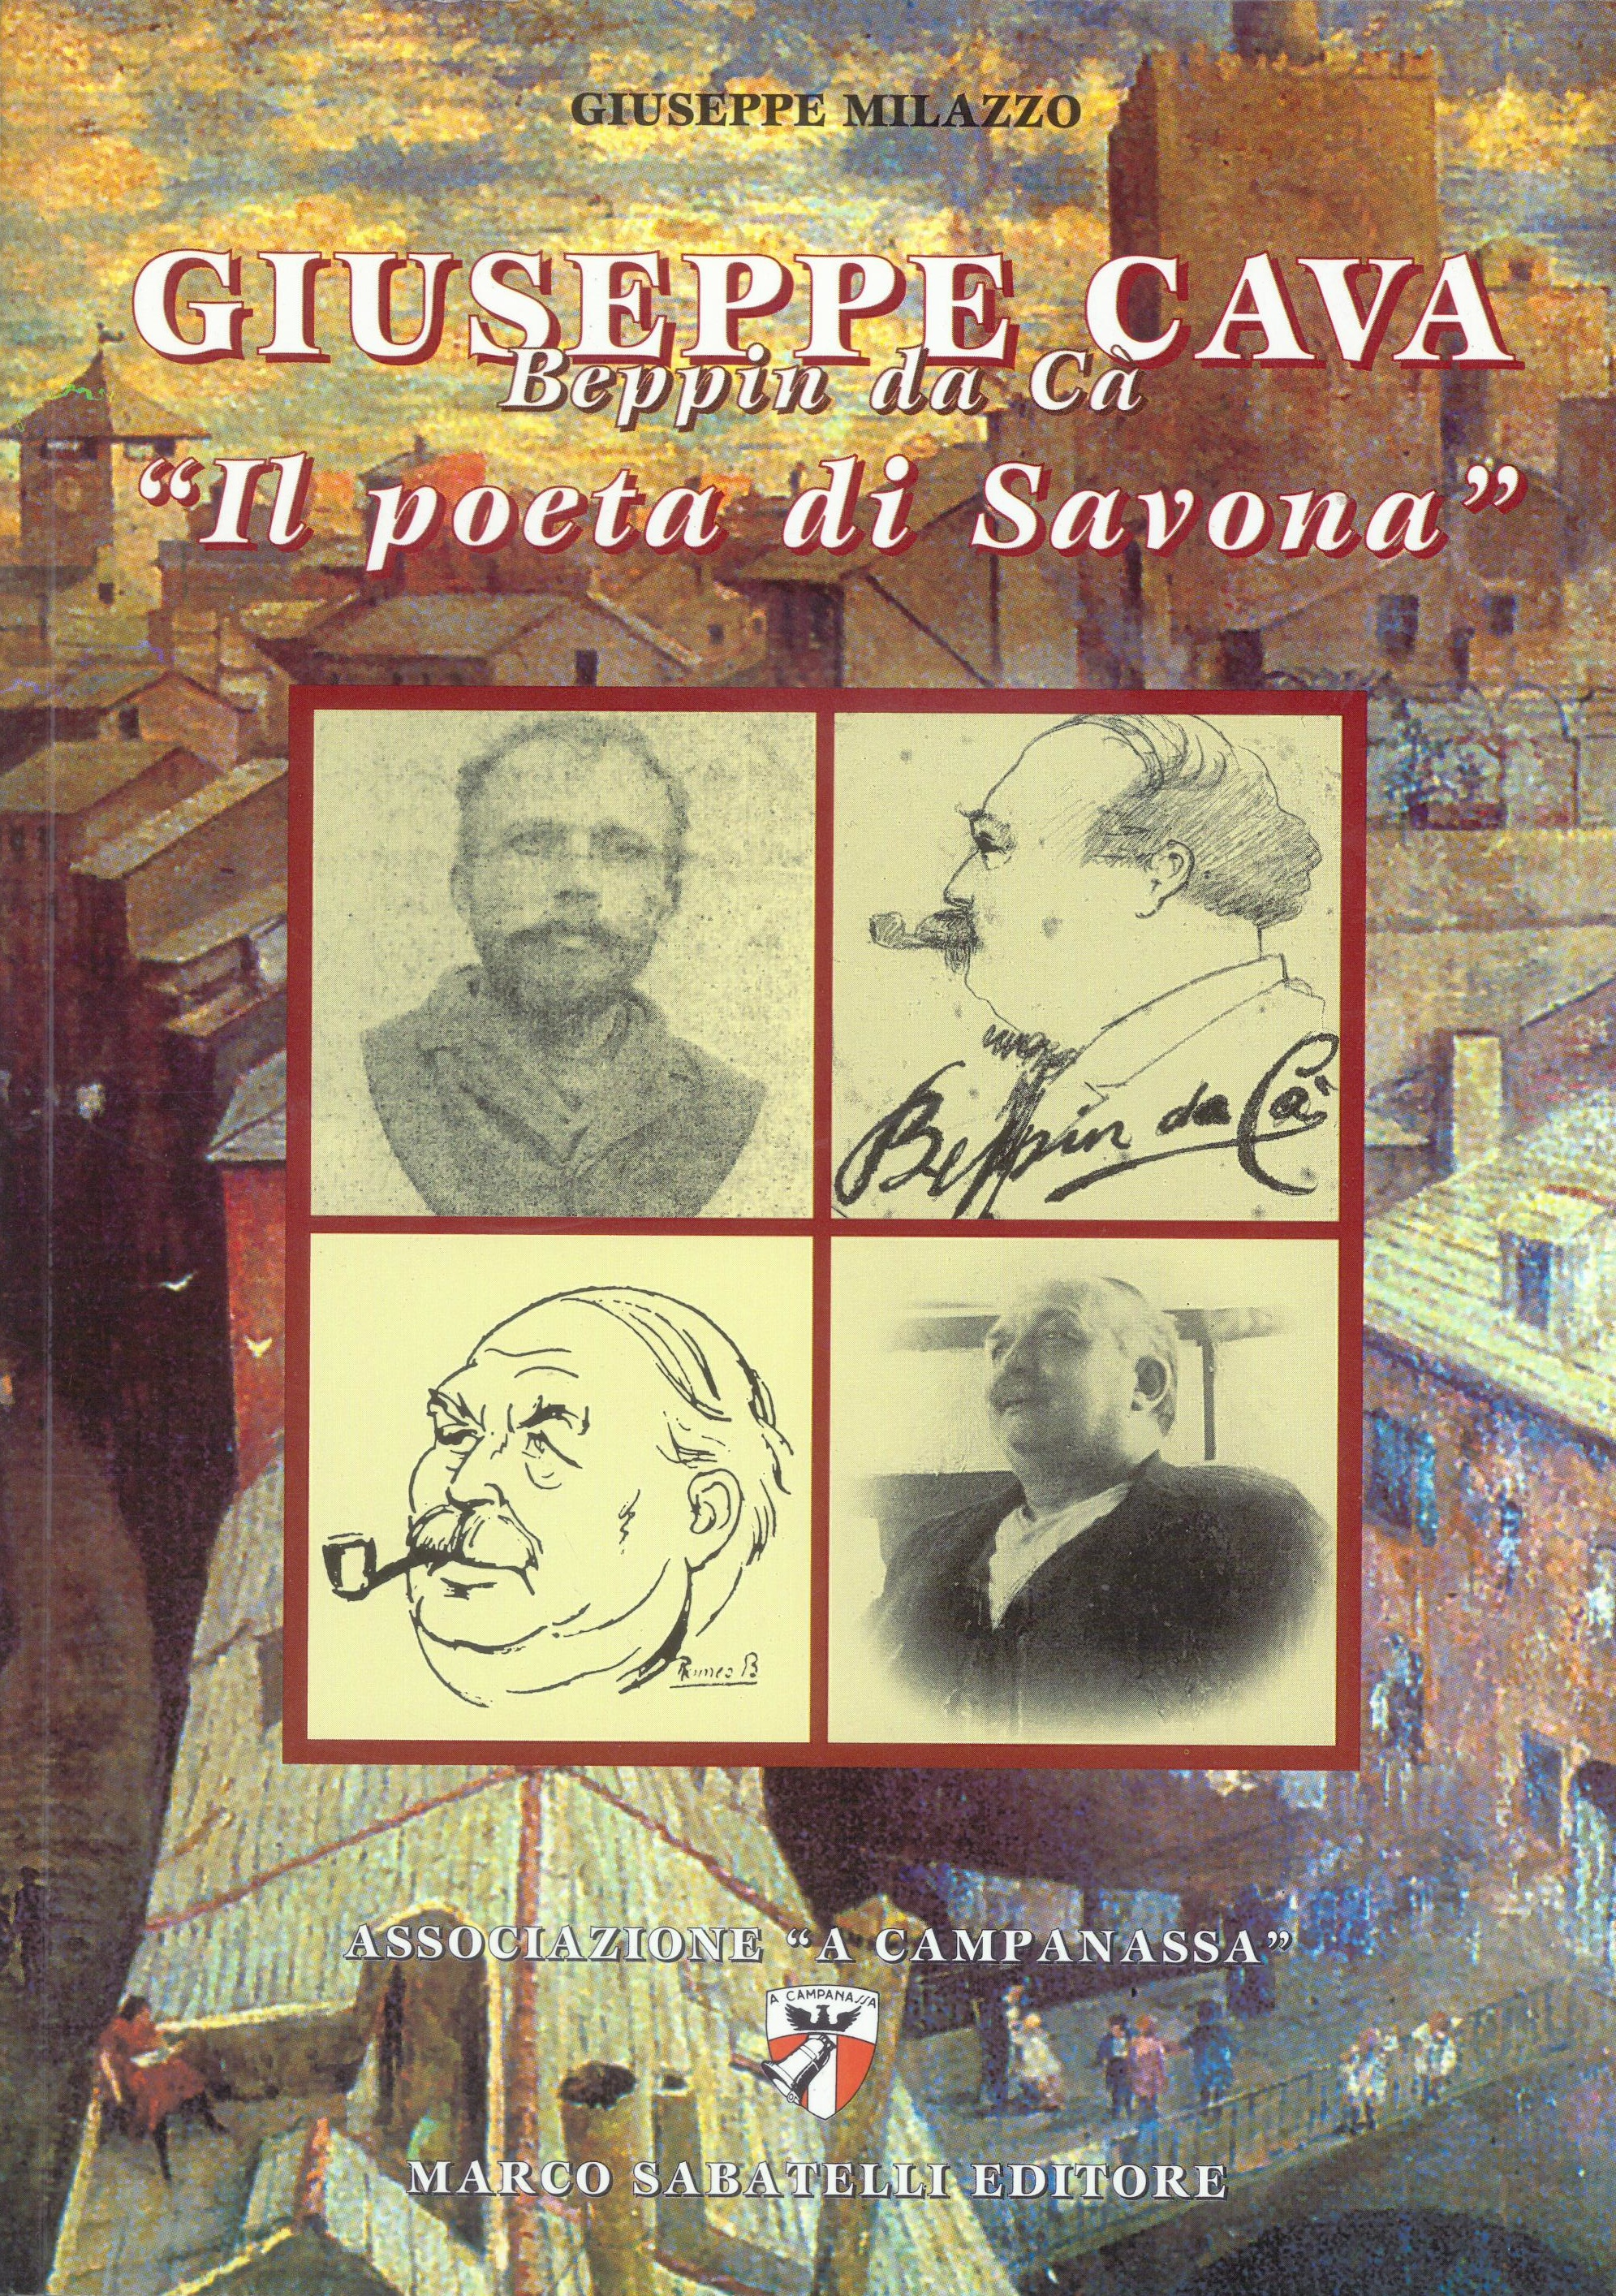 Giuseppe Cava - Il poeta di Savona